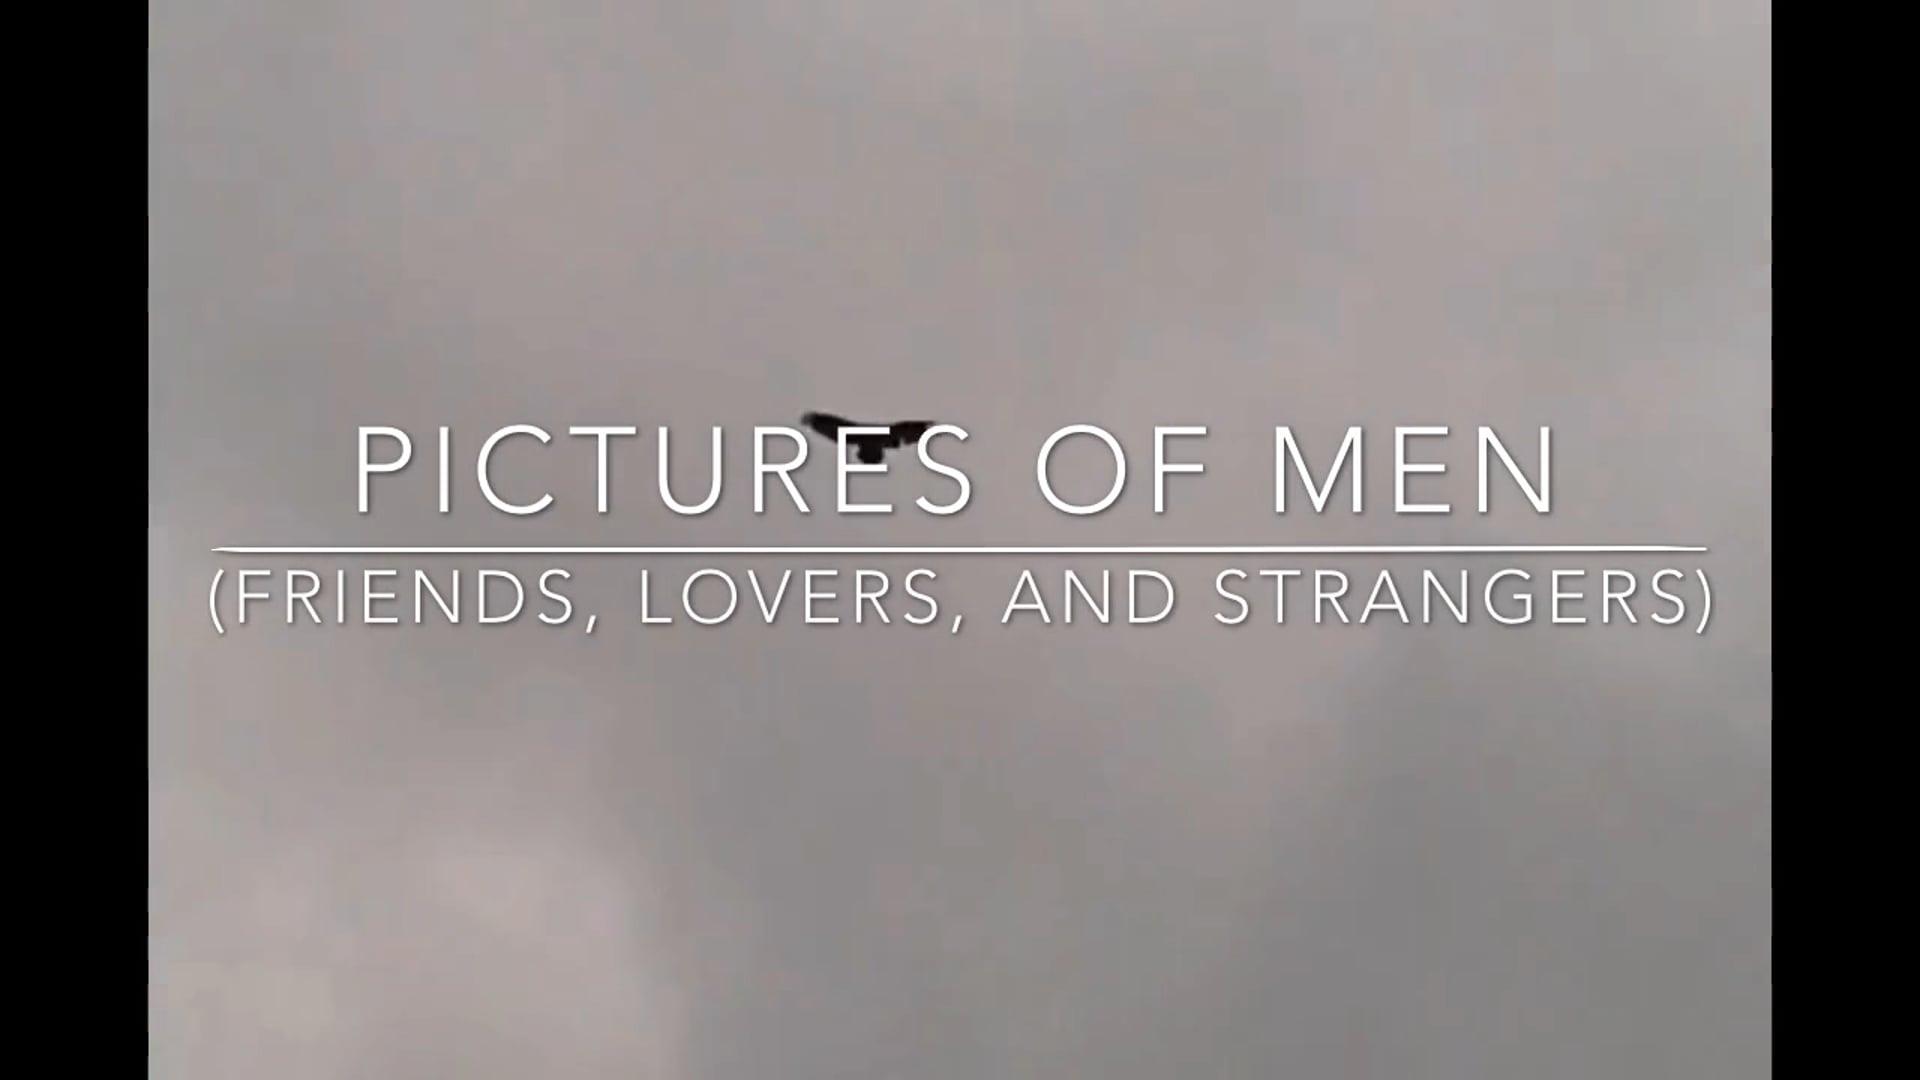 Pictures of men